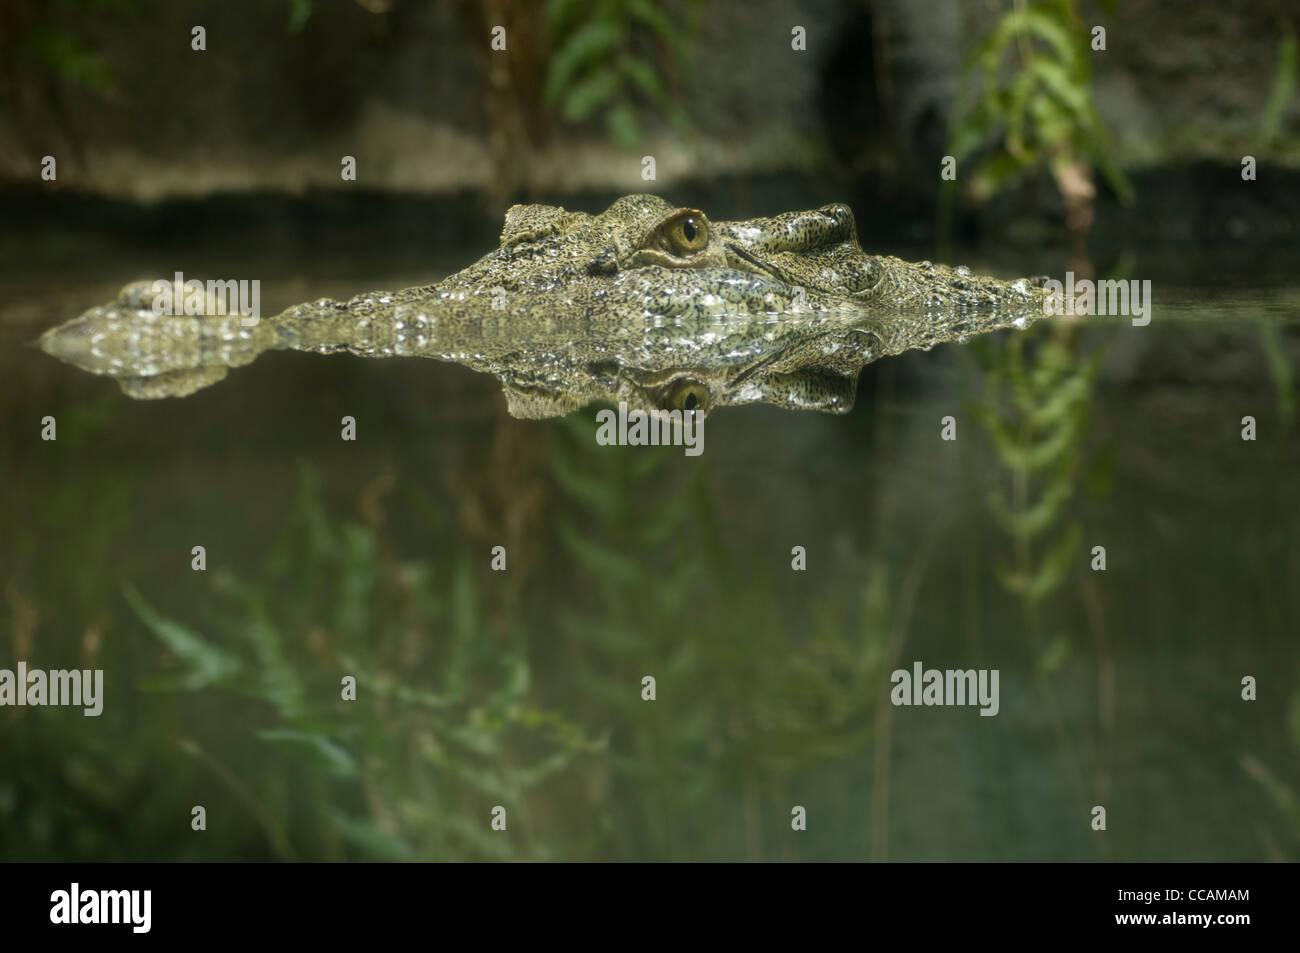 a-salt-water-crocodile-also-known-as-est